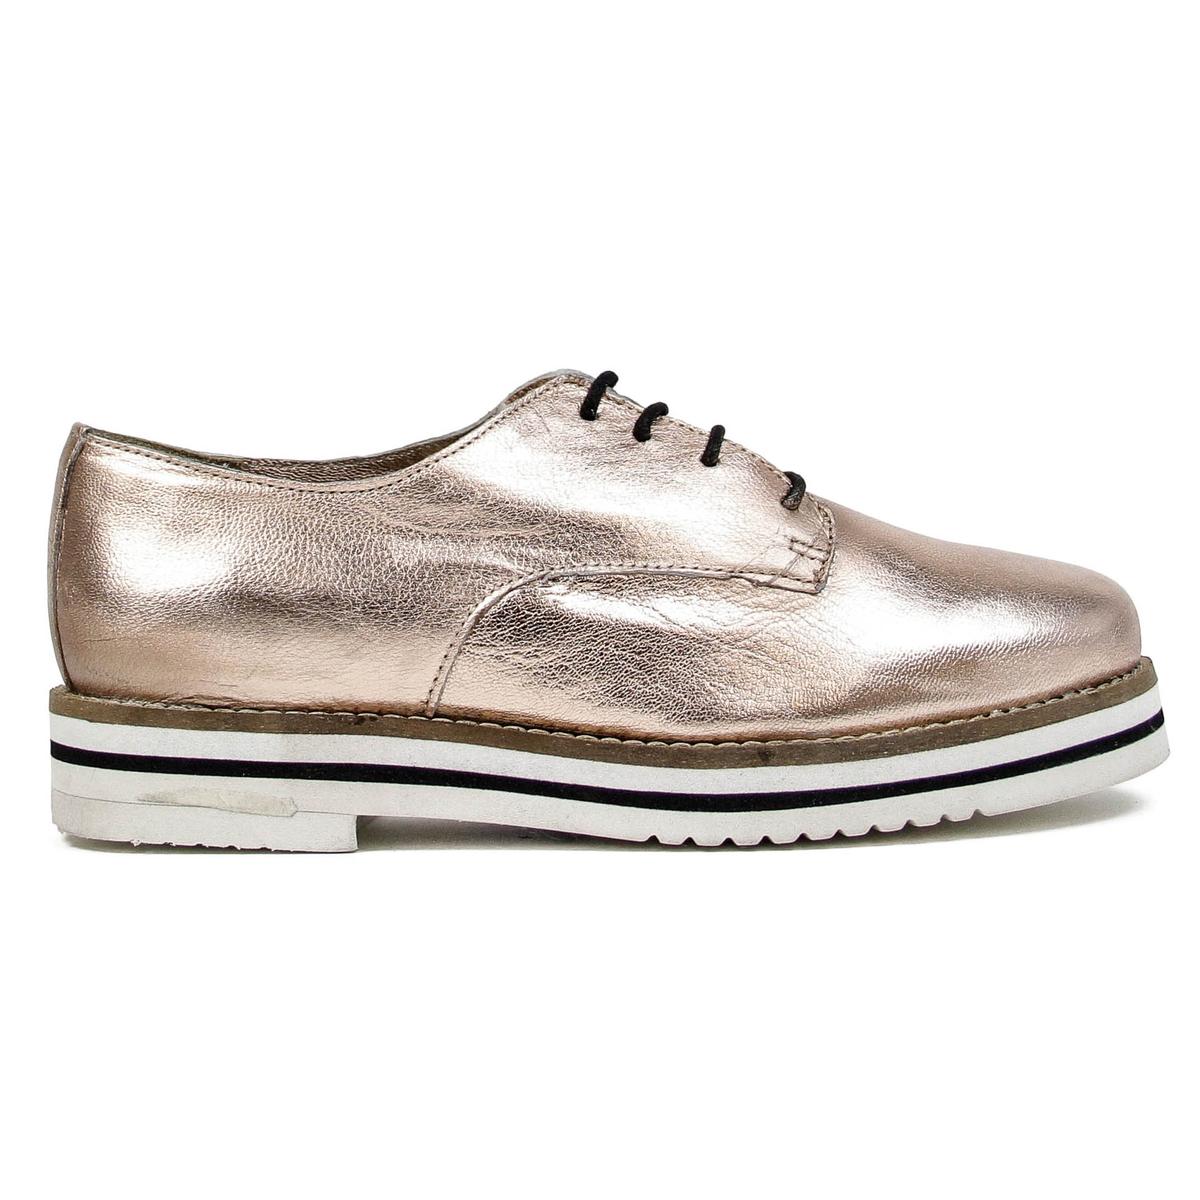 Ботинки-дерби AVOCADO из кожи ботинки дерби из мягкой кожи takarika